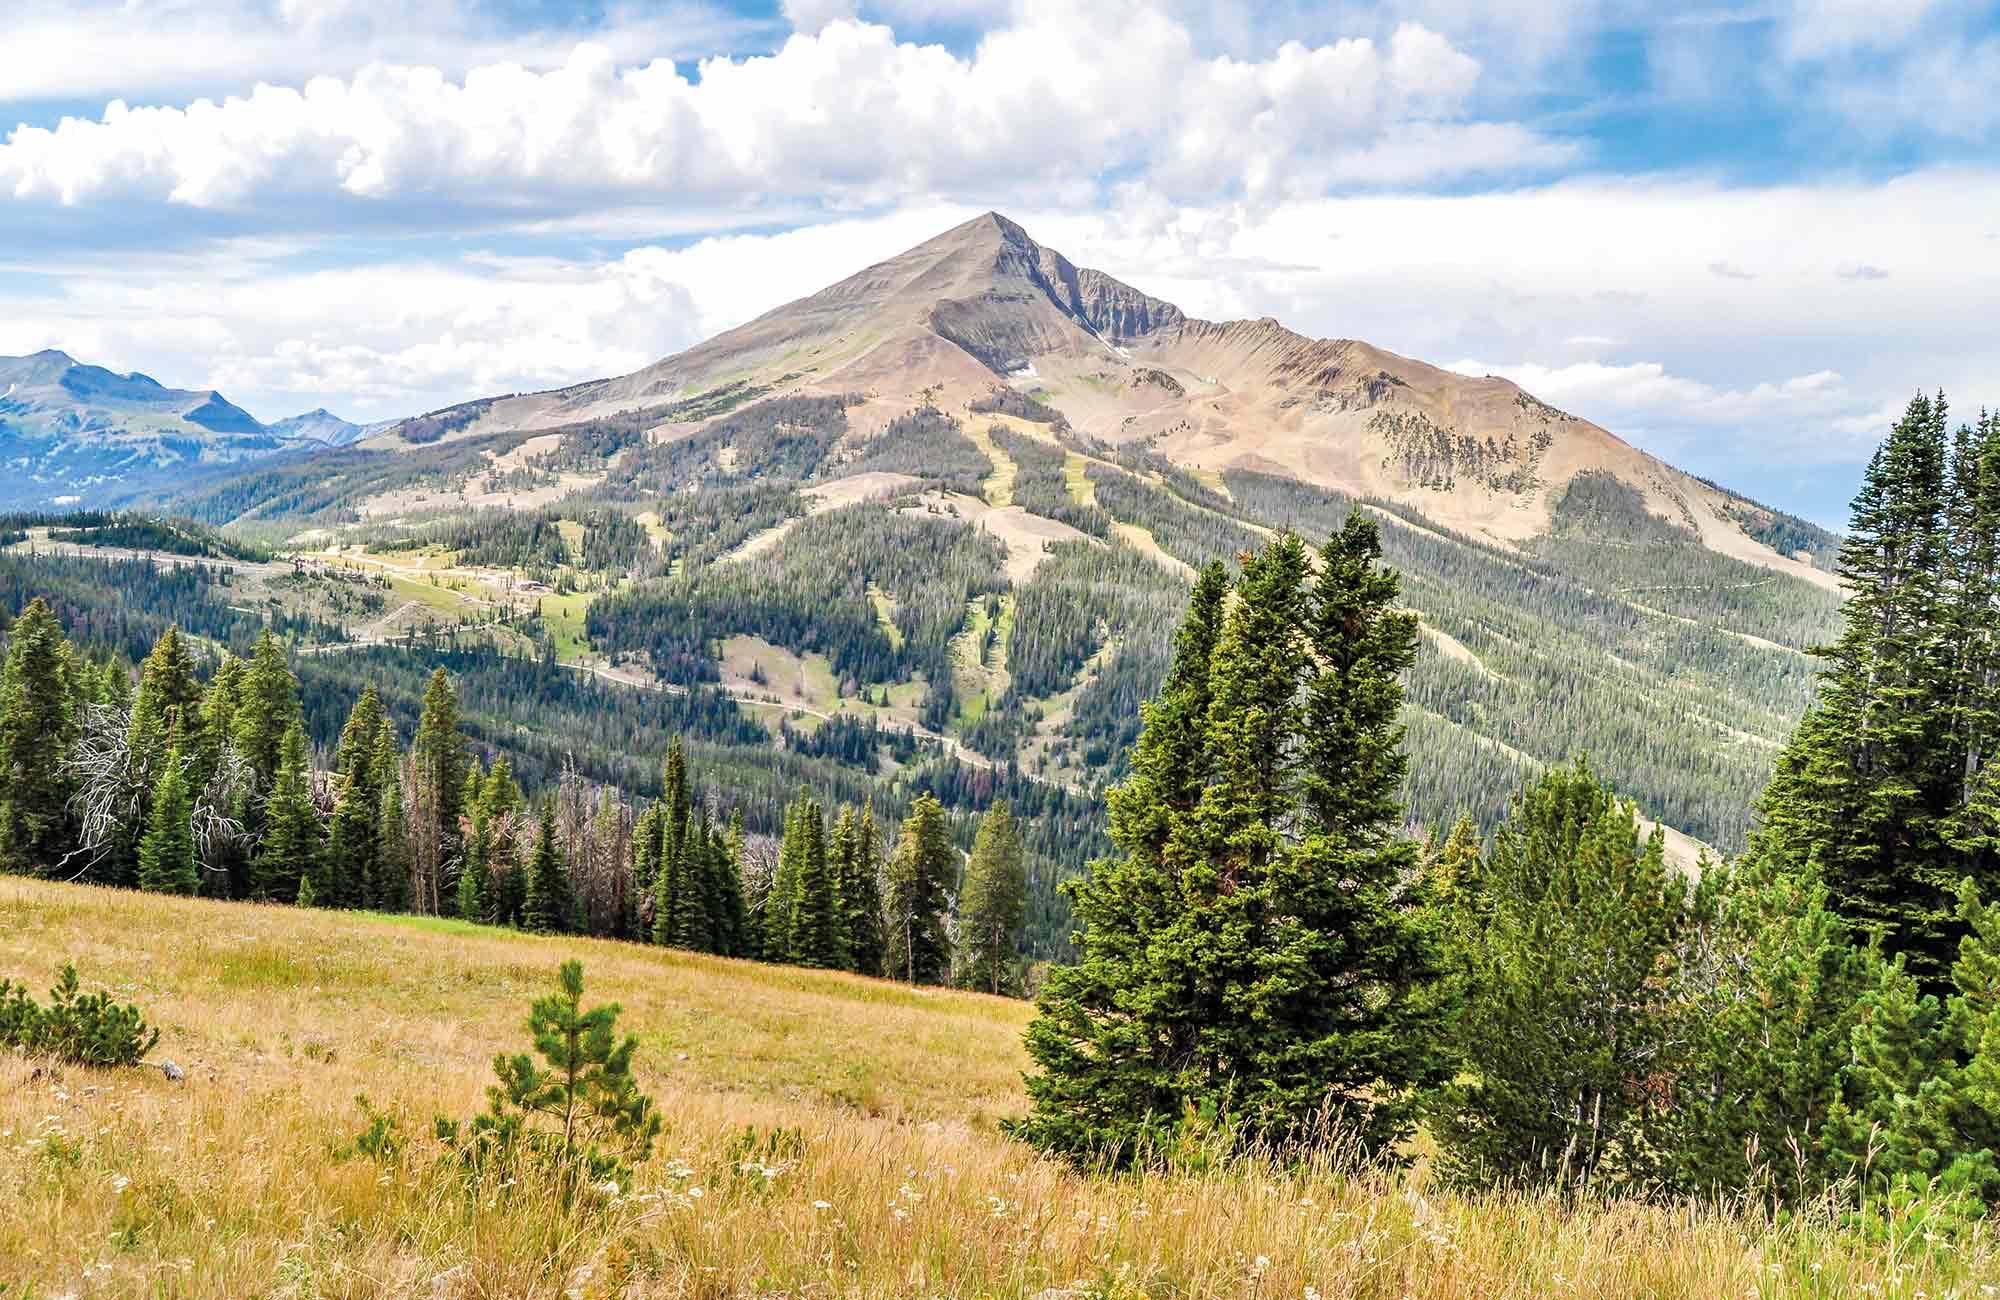 Voyage Montana - Big Sky - Amplitudes